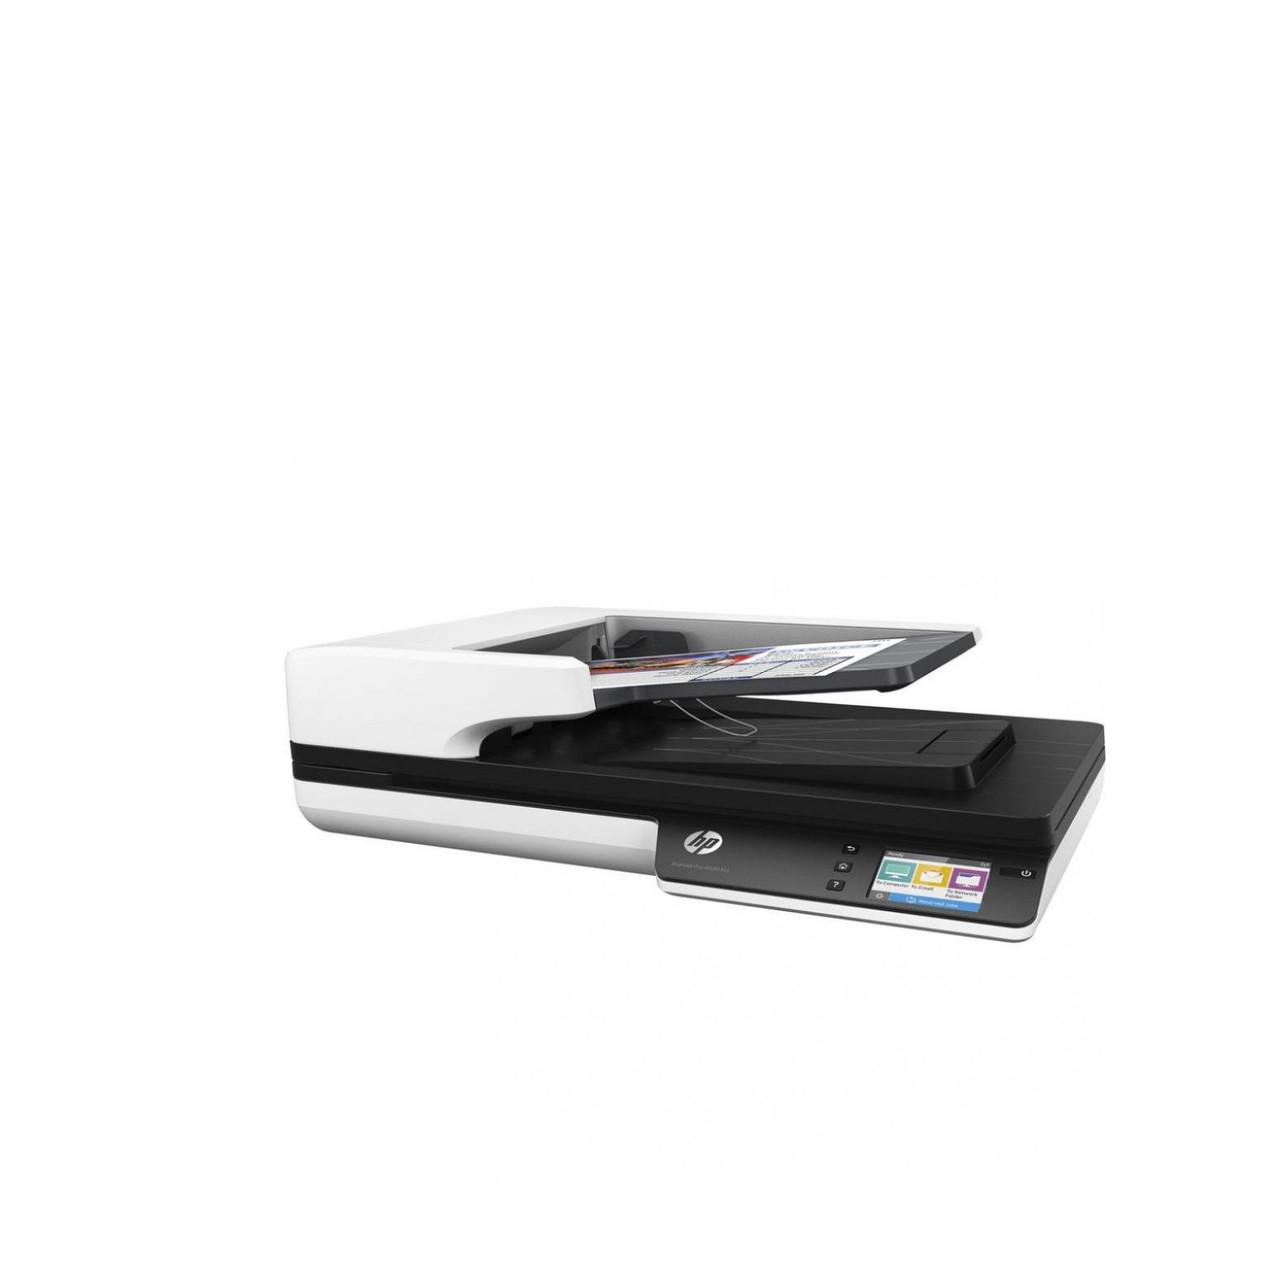 Планшетный сканер HP ScanJet Pro 4500 fn1 (А4, USB, Ethernet) L2749A